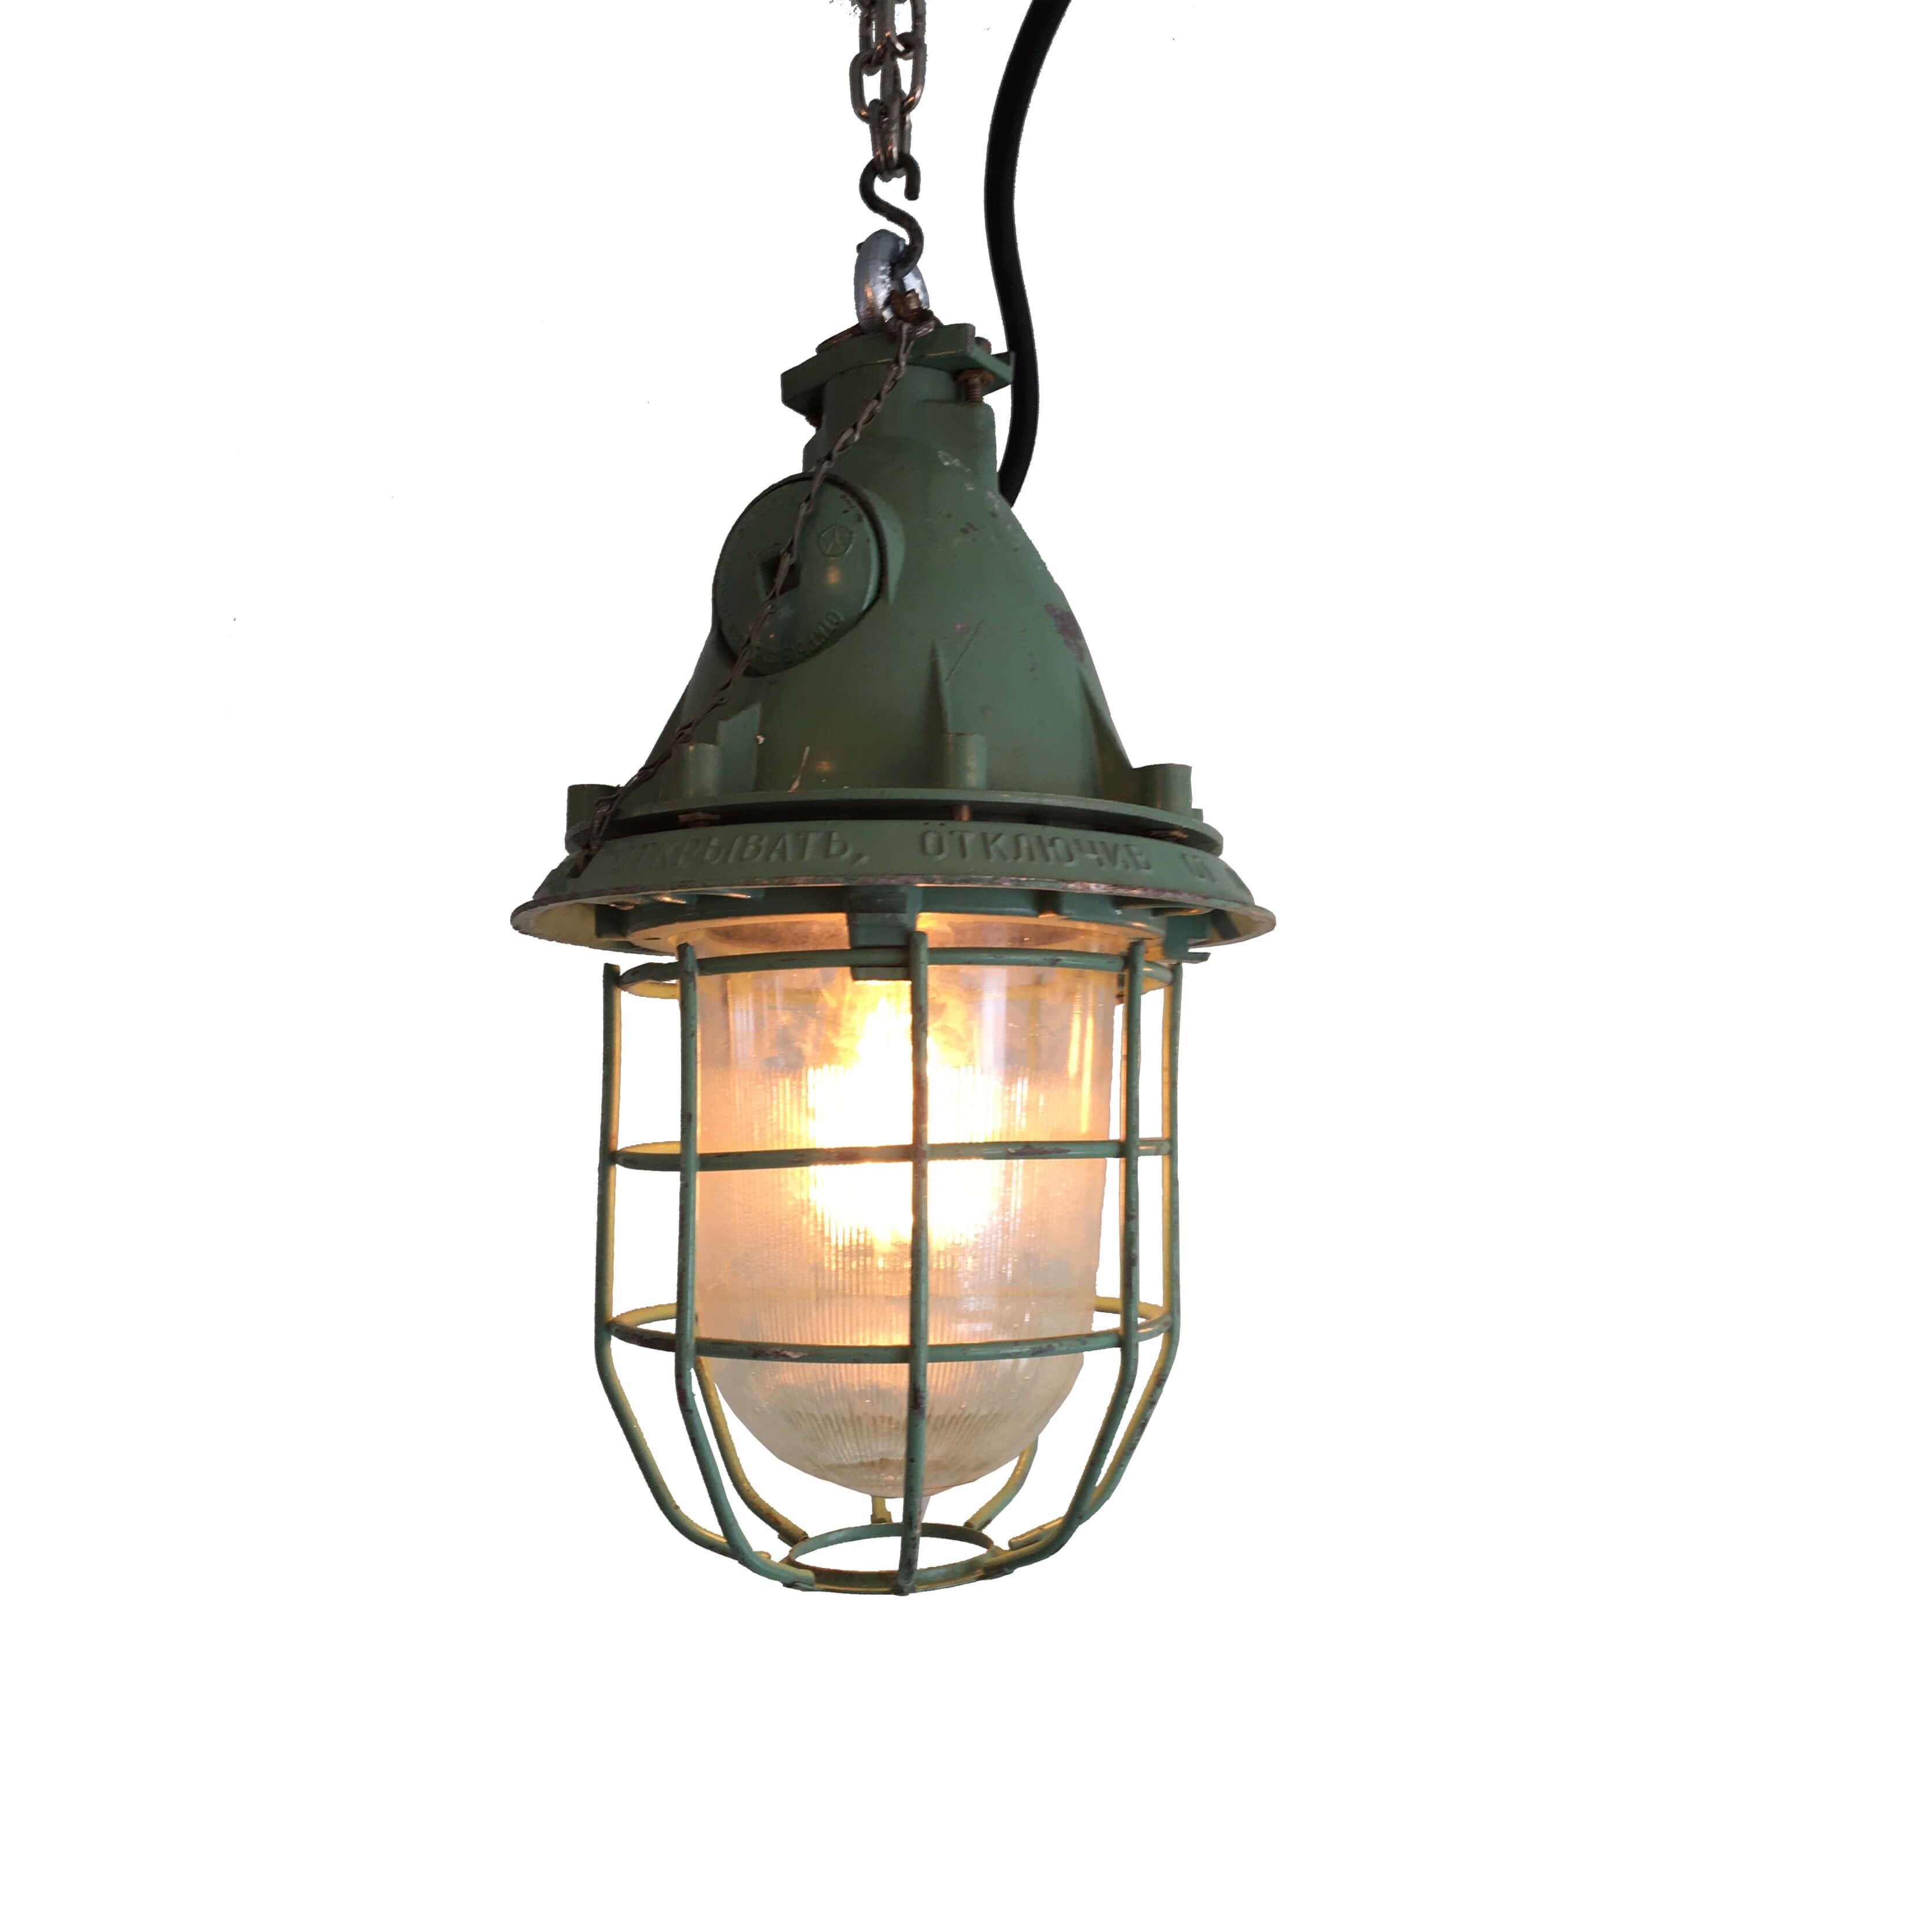 Vintage lampe pendel – Hill Street